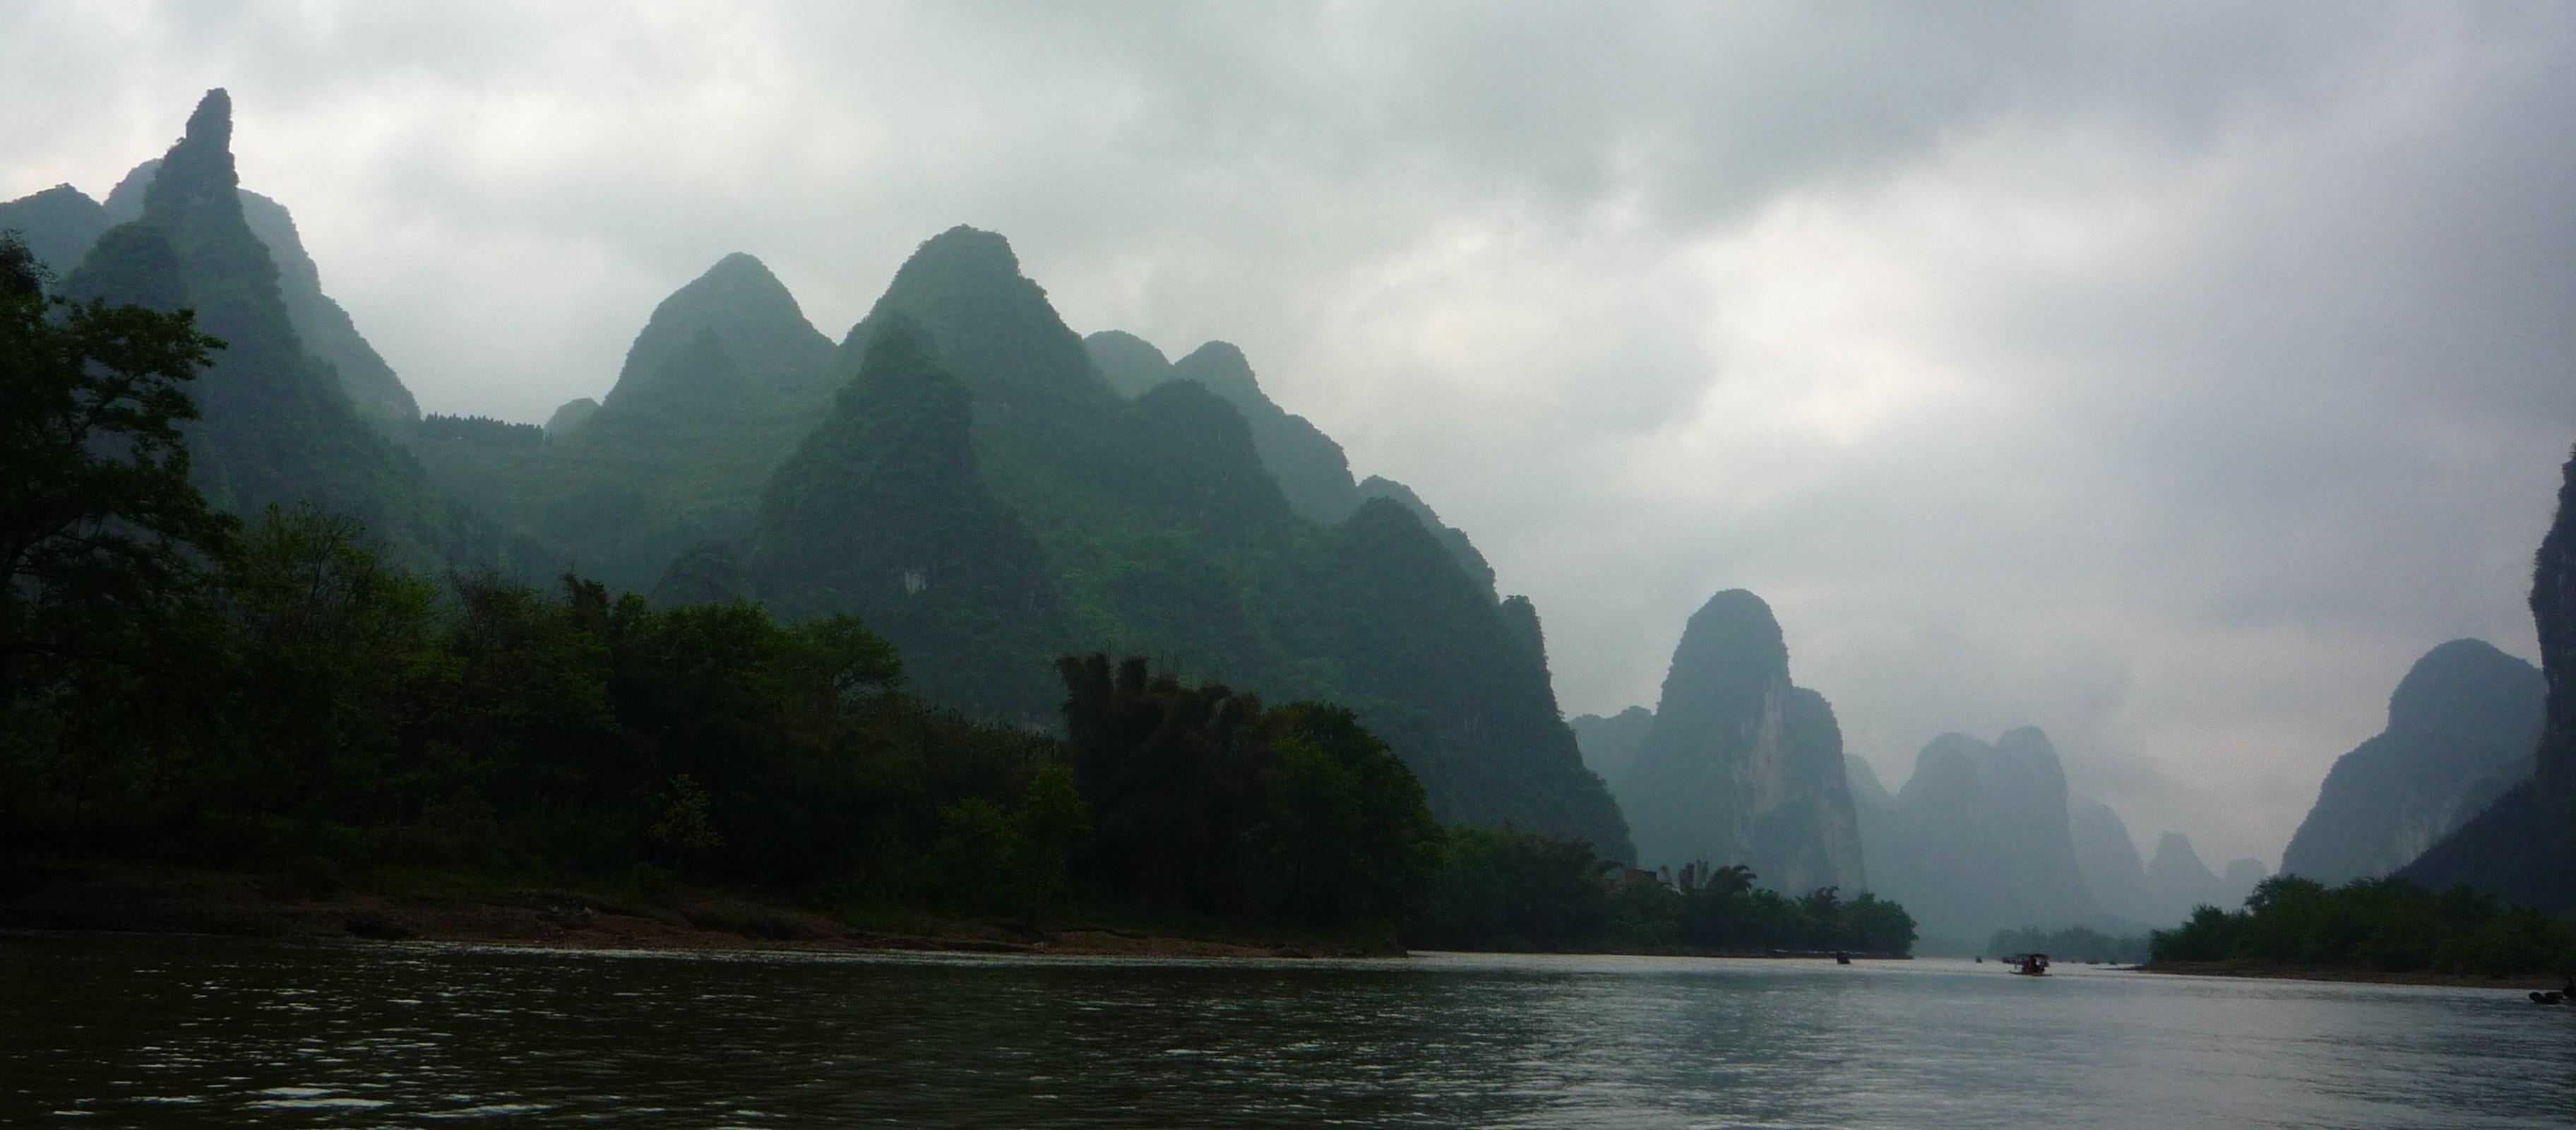 Li River The Little Koo Blog